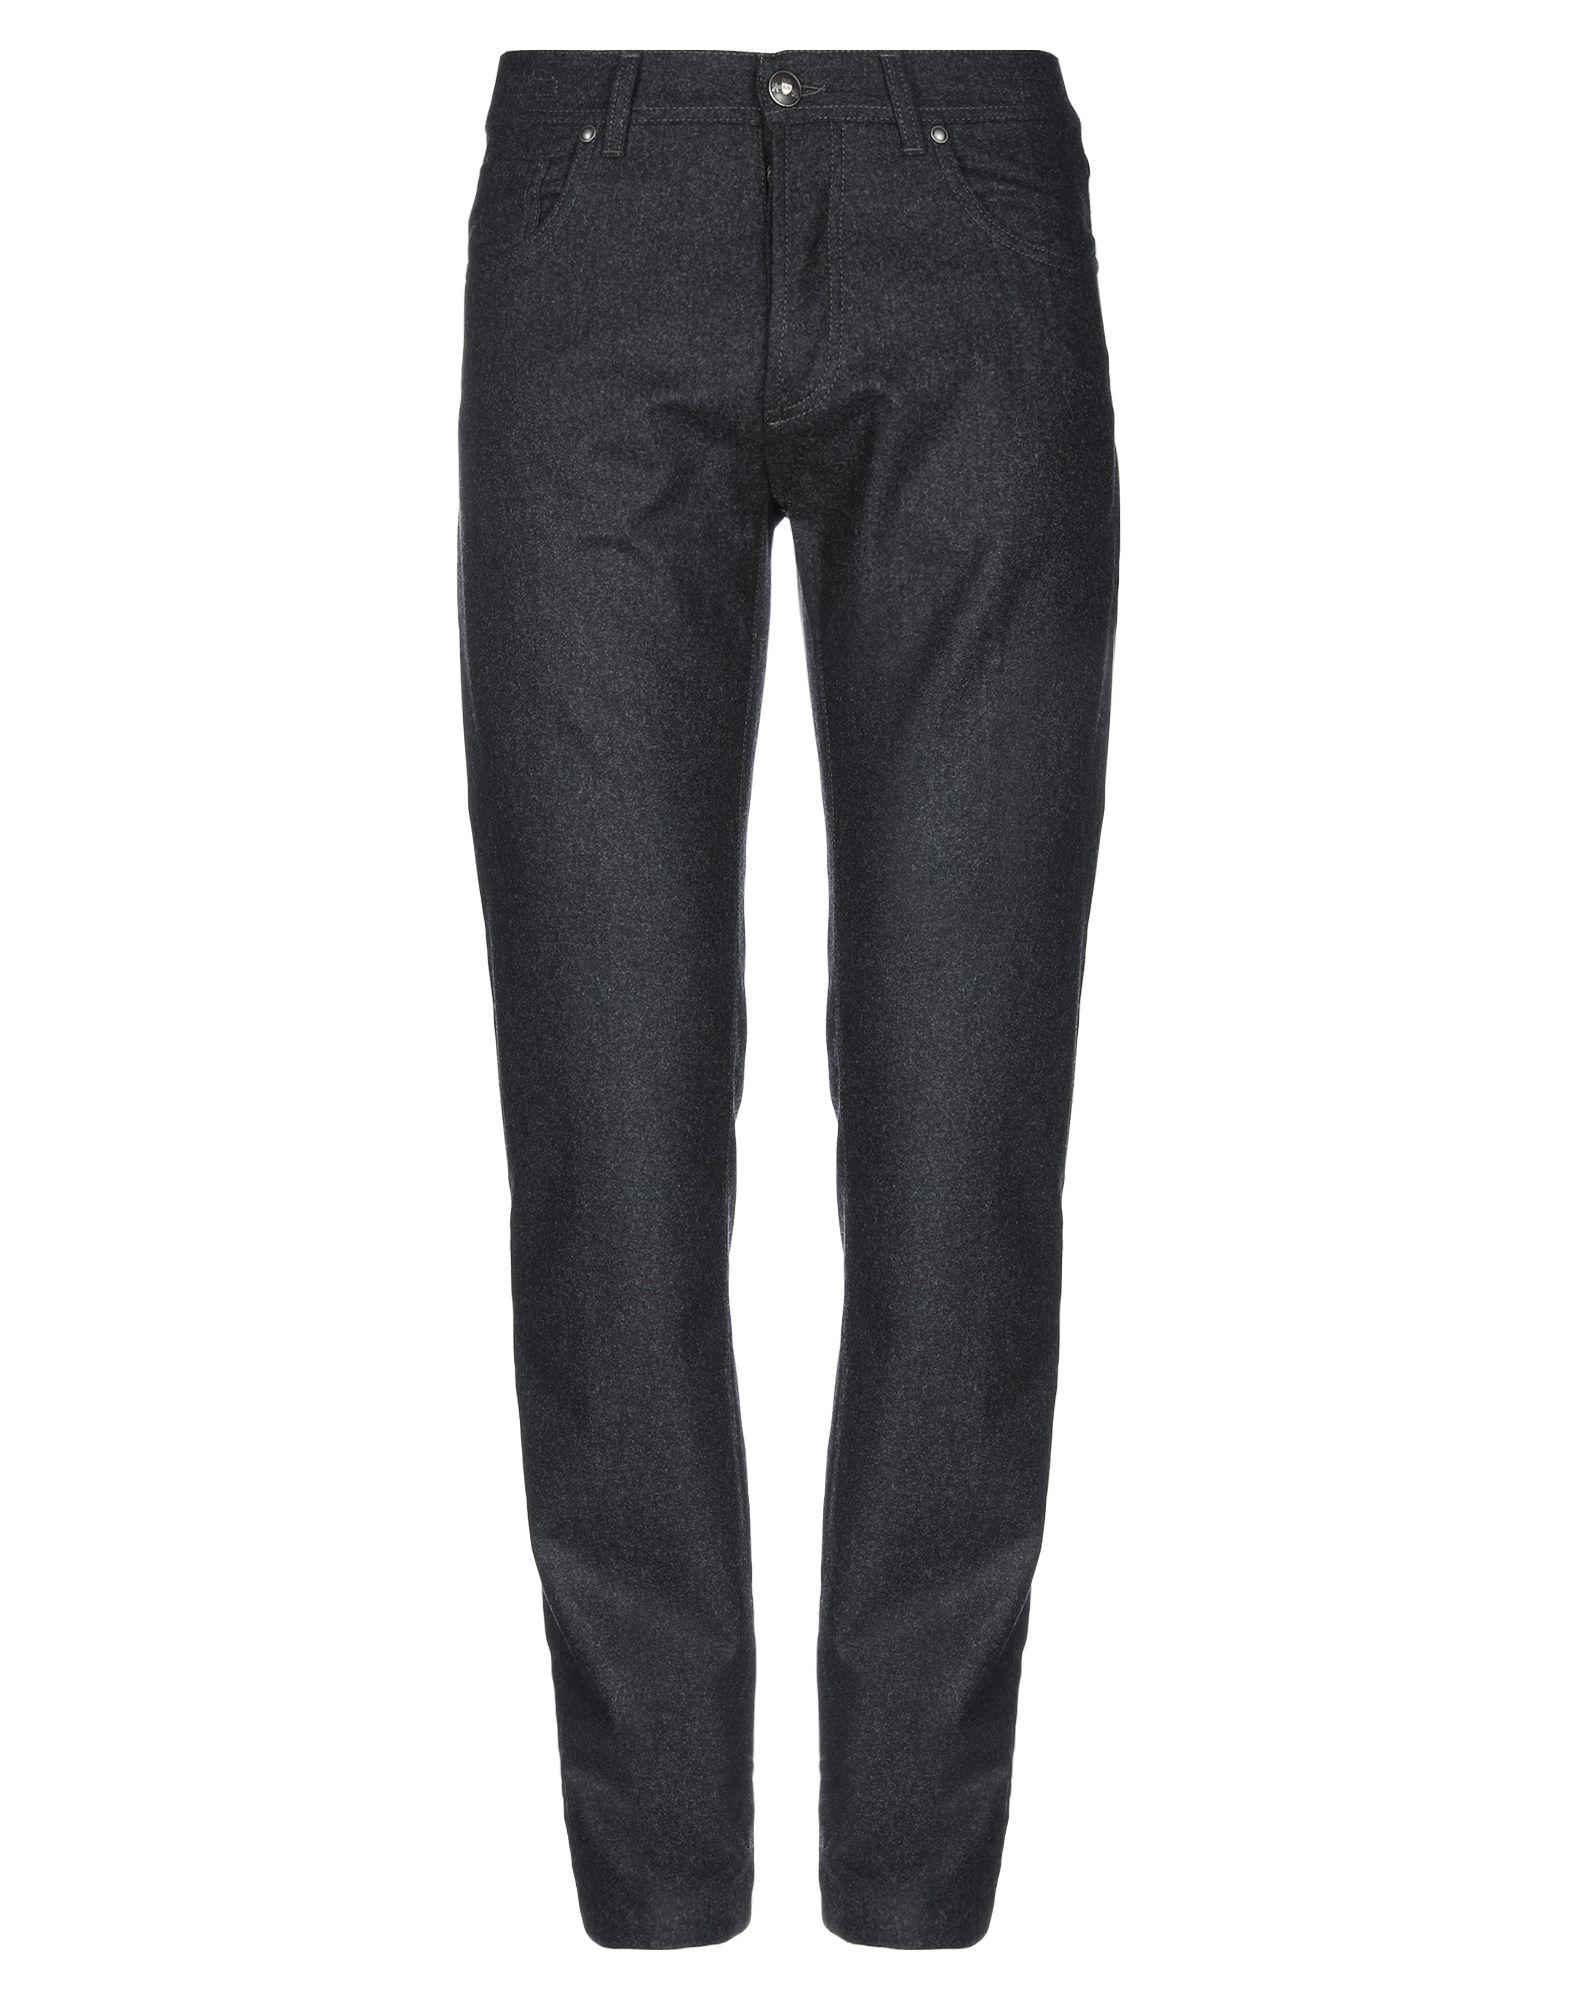 Pantalone Richard James Marronee uomo uomo uomo - 13374303IX 847